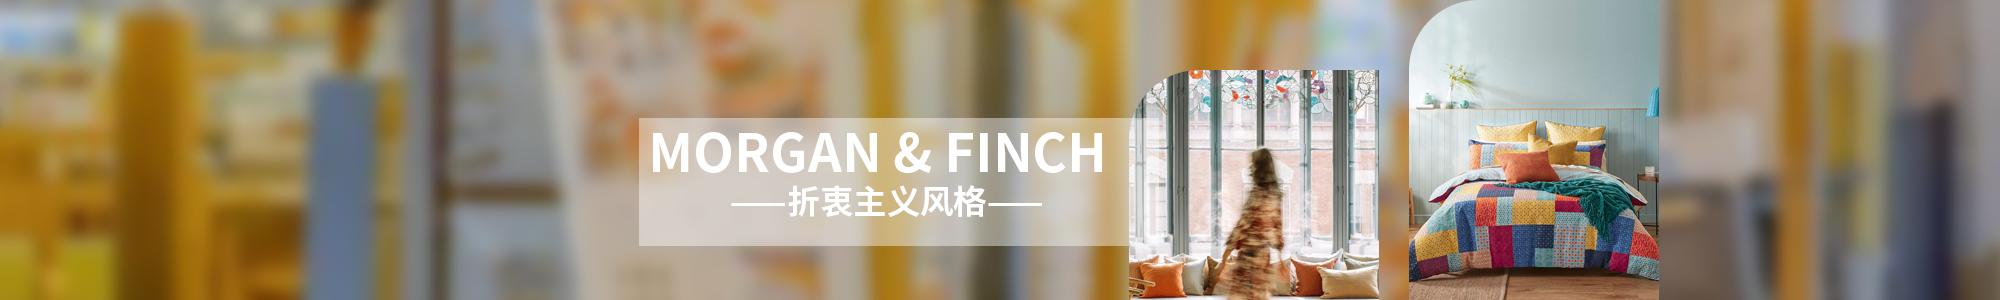 MORGAN & FINCH折衷主义风格